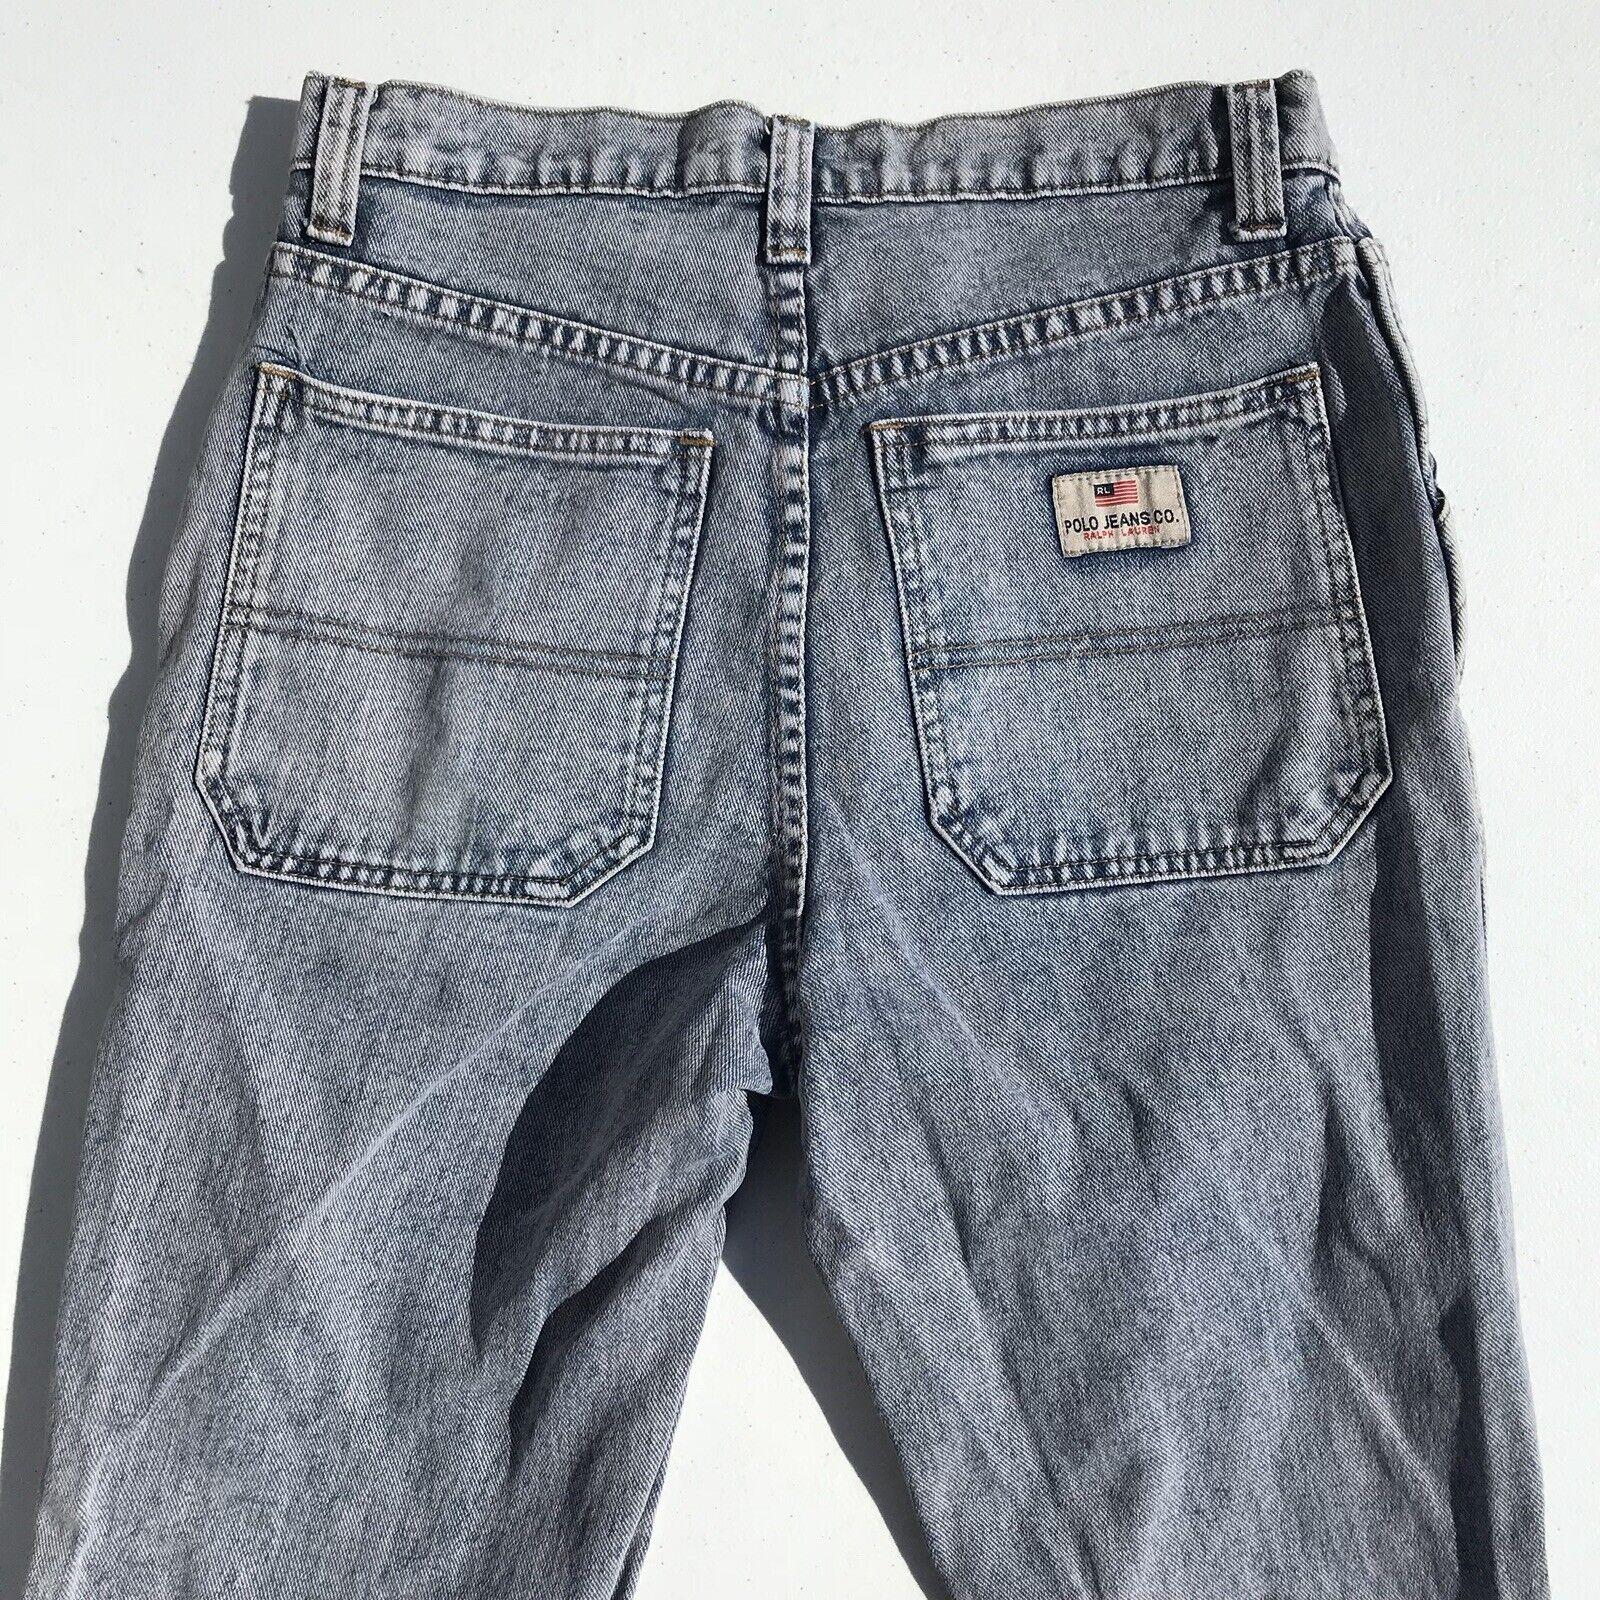 Polo Ralph Lauren Jeans Men's Size 31 Acid Denim  S